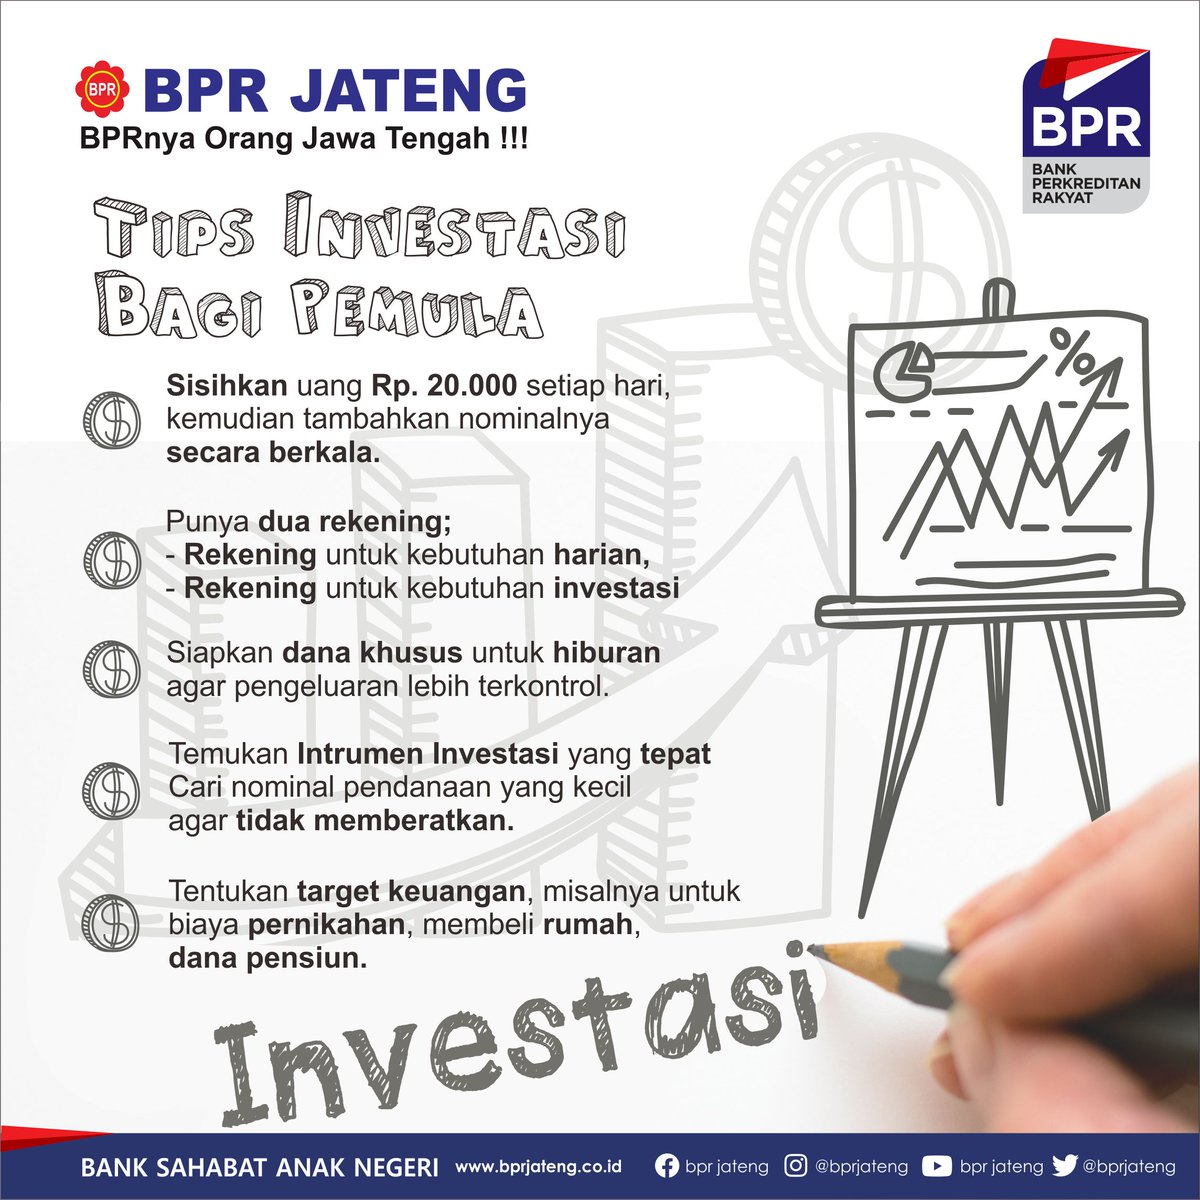 Berbagi Tips investasi ke masa depan yang lebih baik... semoga bermanfaat > > >  #investasi #tabungan #bprjateng #semarang #rumah #danapensiun #Indonesia #KreditCepat #kreditmudah #Kreditmurah #Semangat #finance #jatenggayeng #jateng #jawatengah #bank #bpr #bankperkreditanrakyatpic.twitter.com/U3P0zxk8Lu